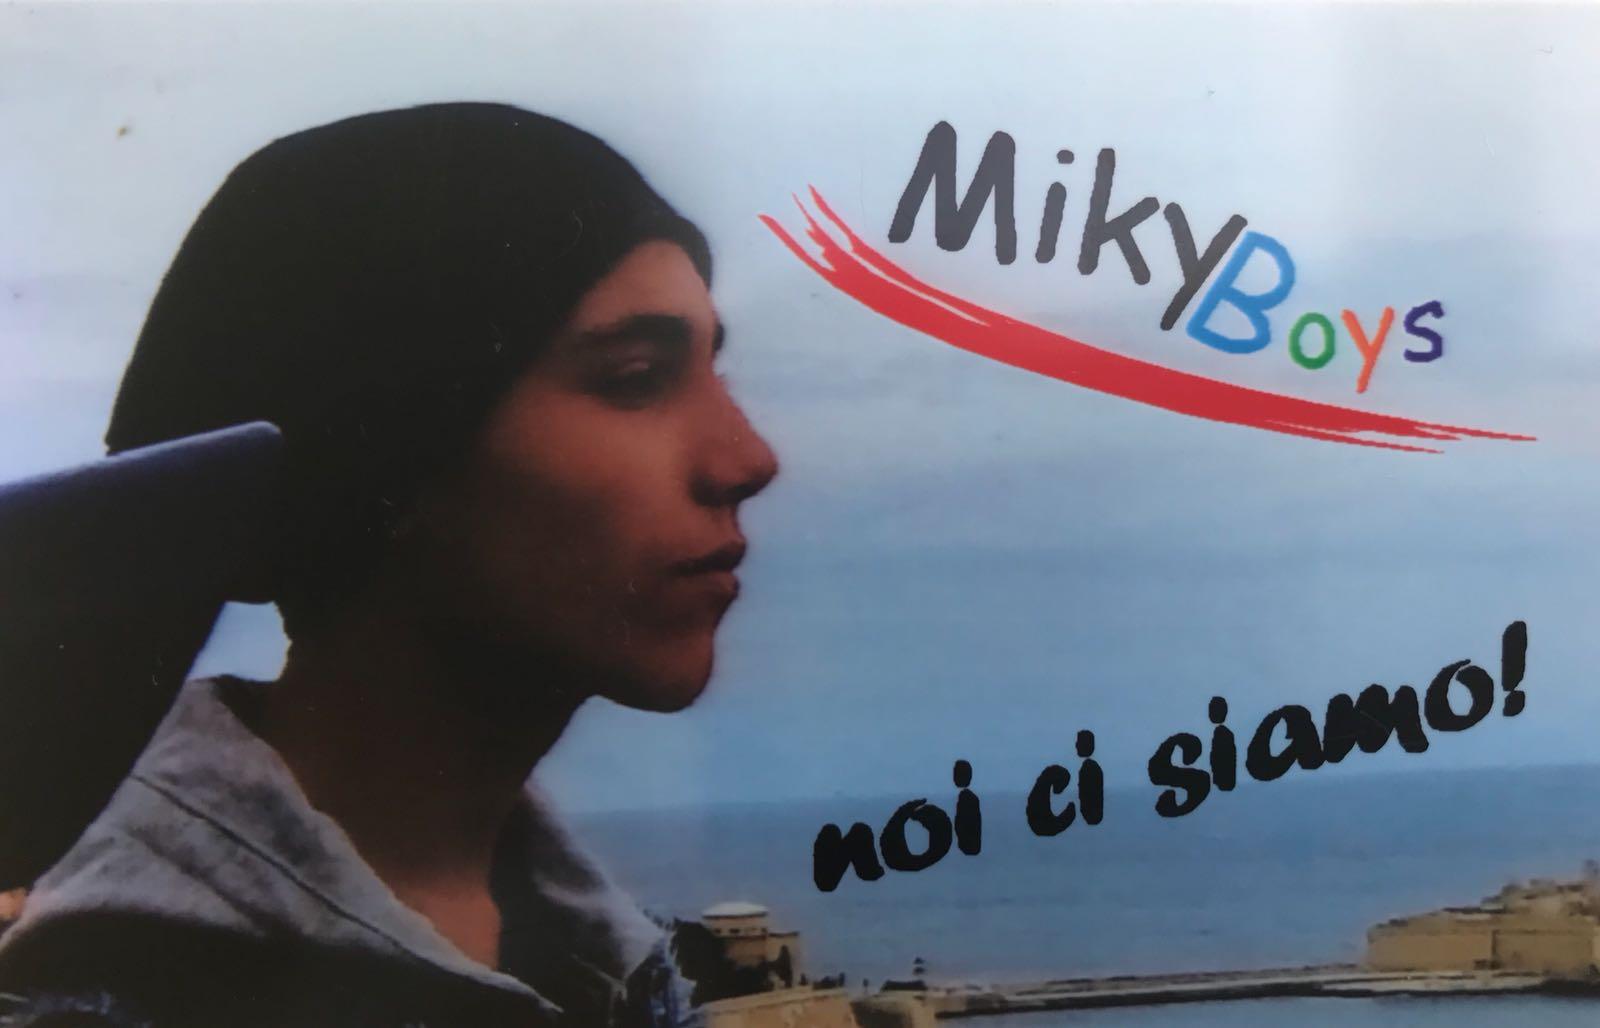 Miky Boys